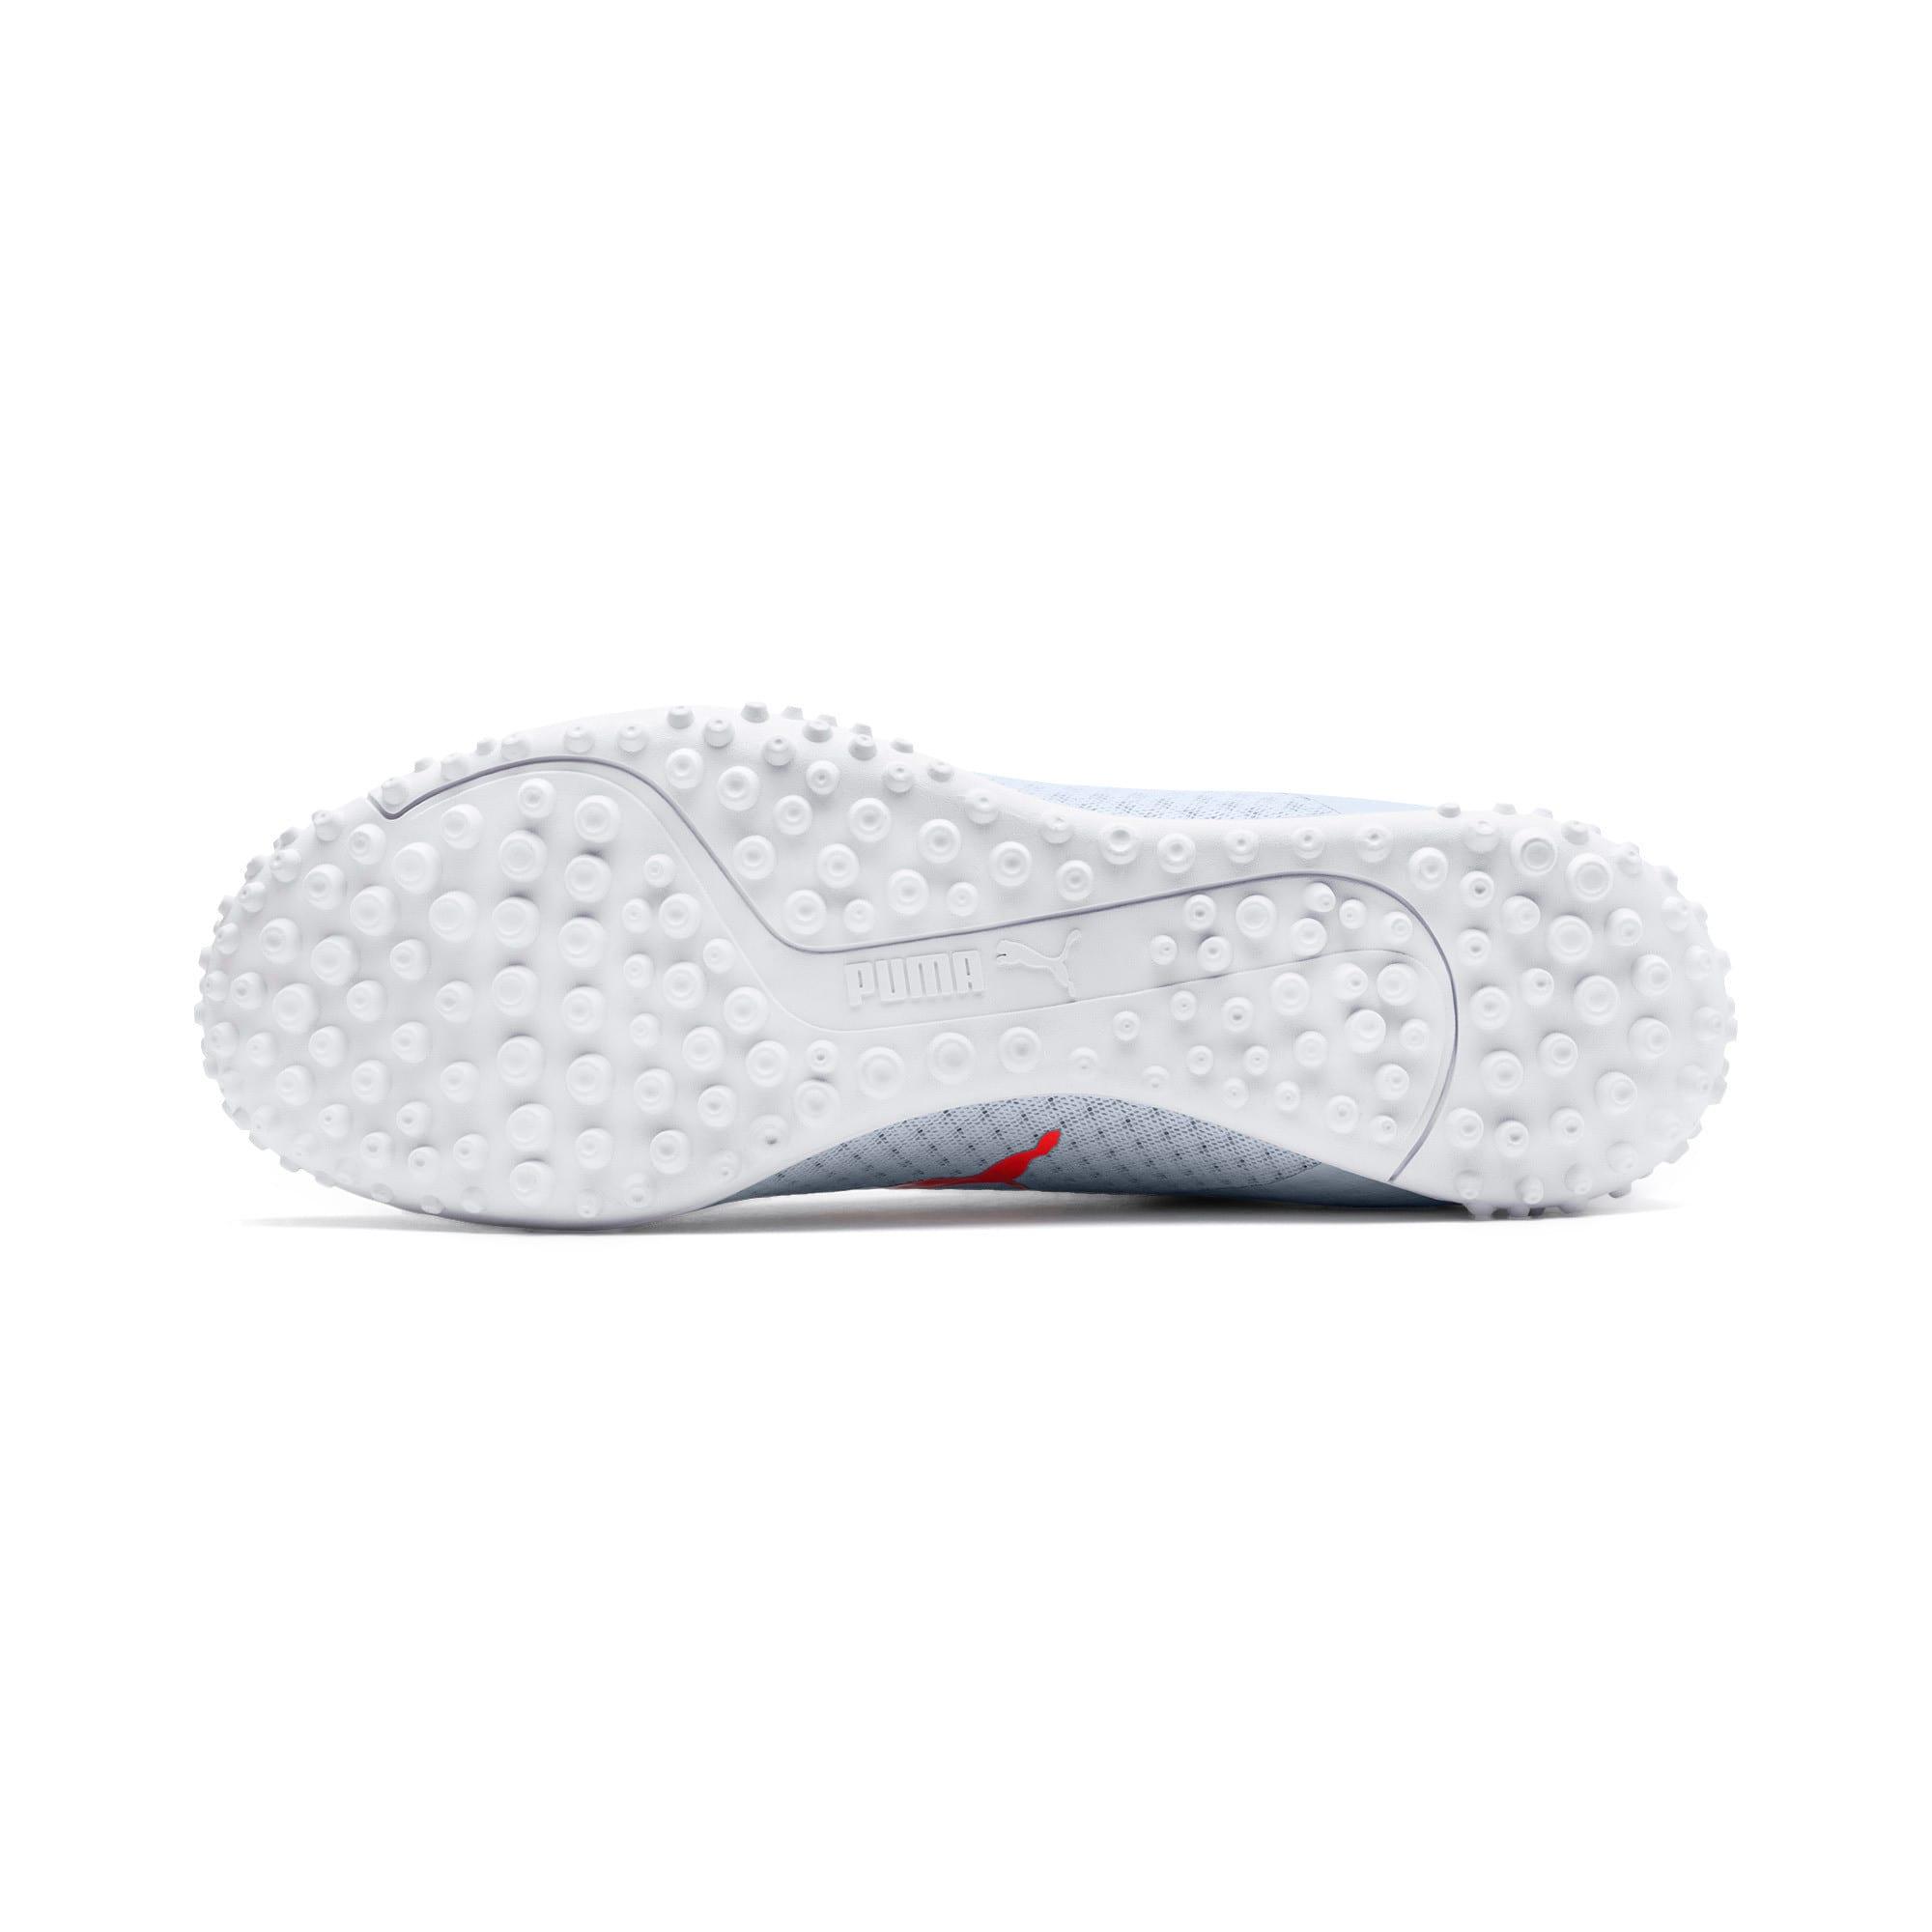 Thumbnail 5 of 365 Concrete 2 ST Men's Soccer Shoes, Grey Dawn-Nrgy Red-White, medium